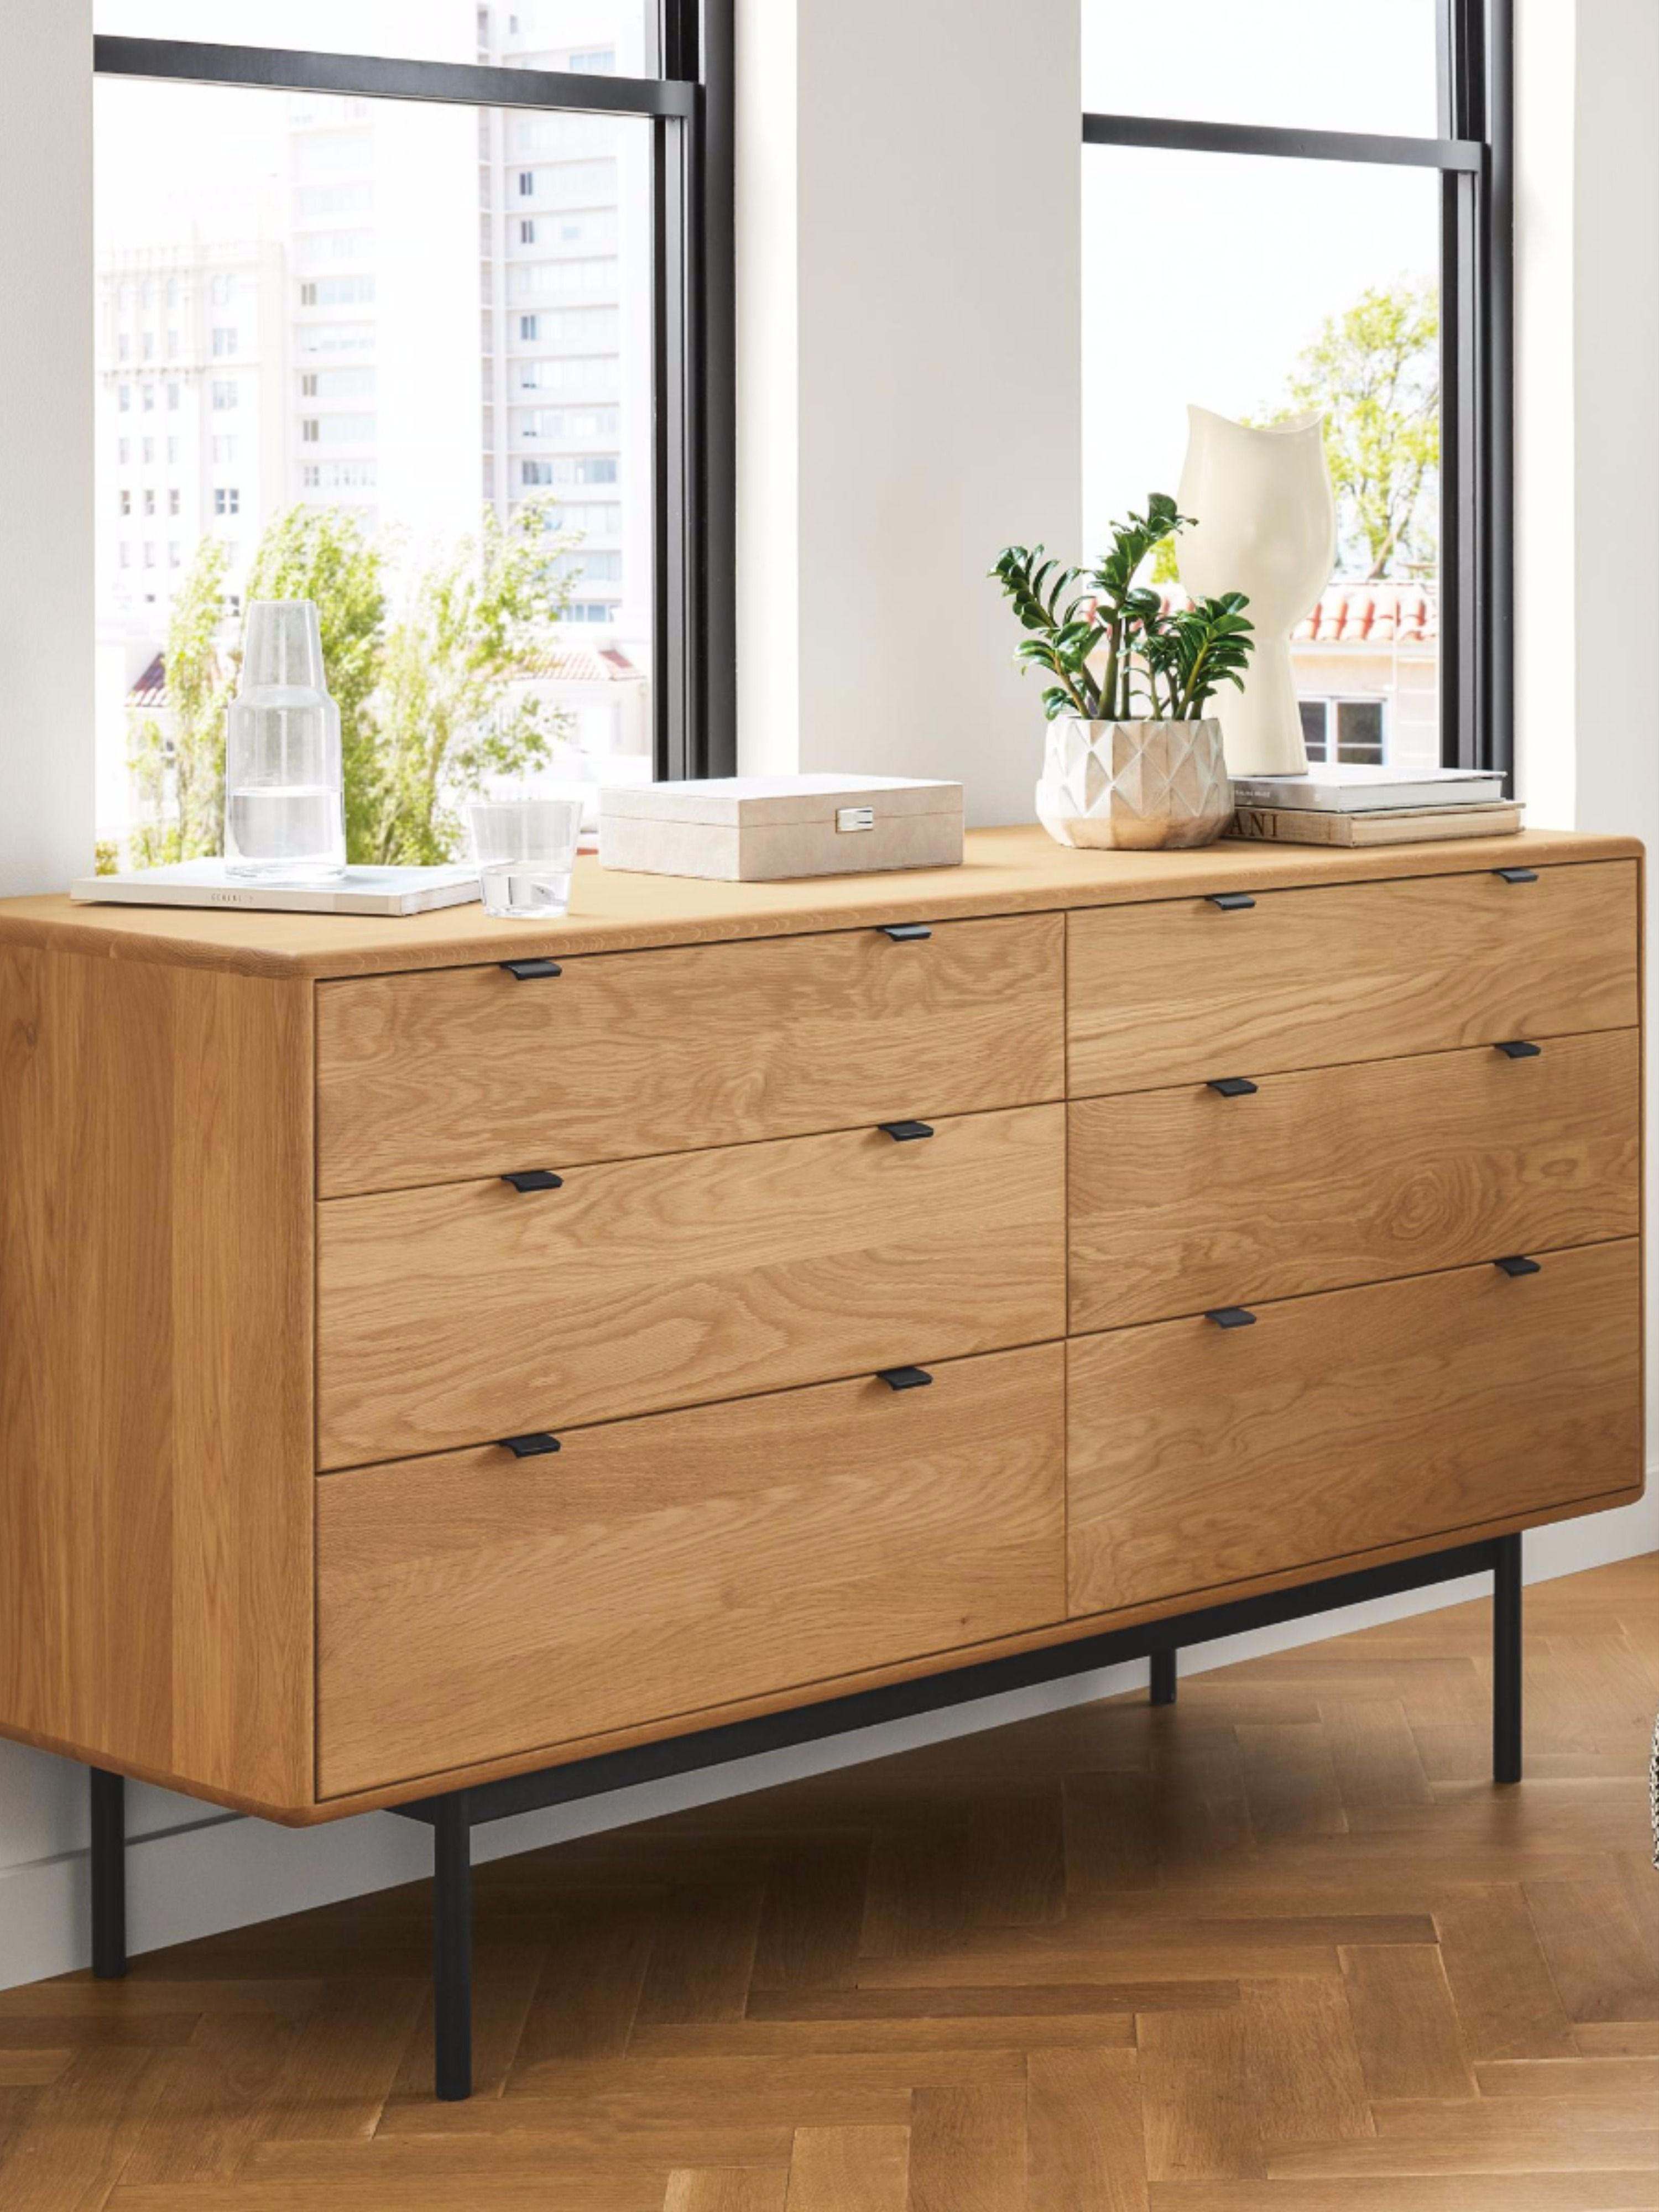 Hensley Dressers Modern Dressers Modern Bedroom Furniture Room Board Modern Bedroom Dressers Modern Dresser Wood Bedroom Furniture